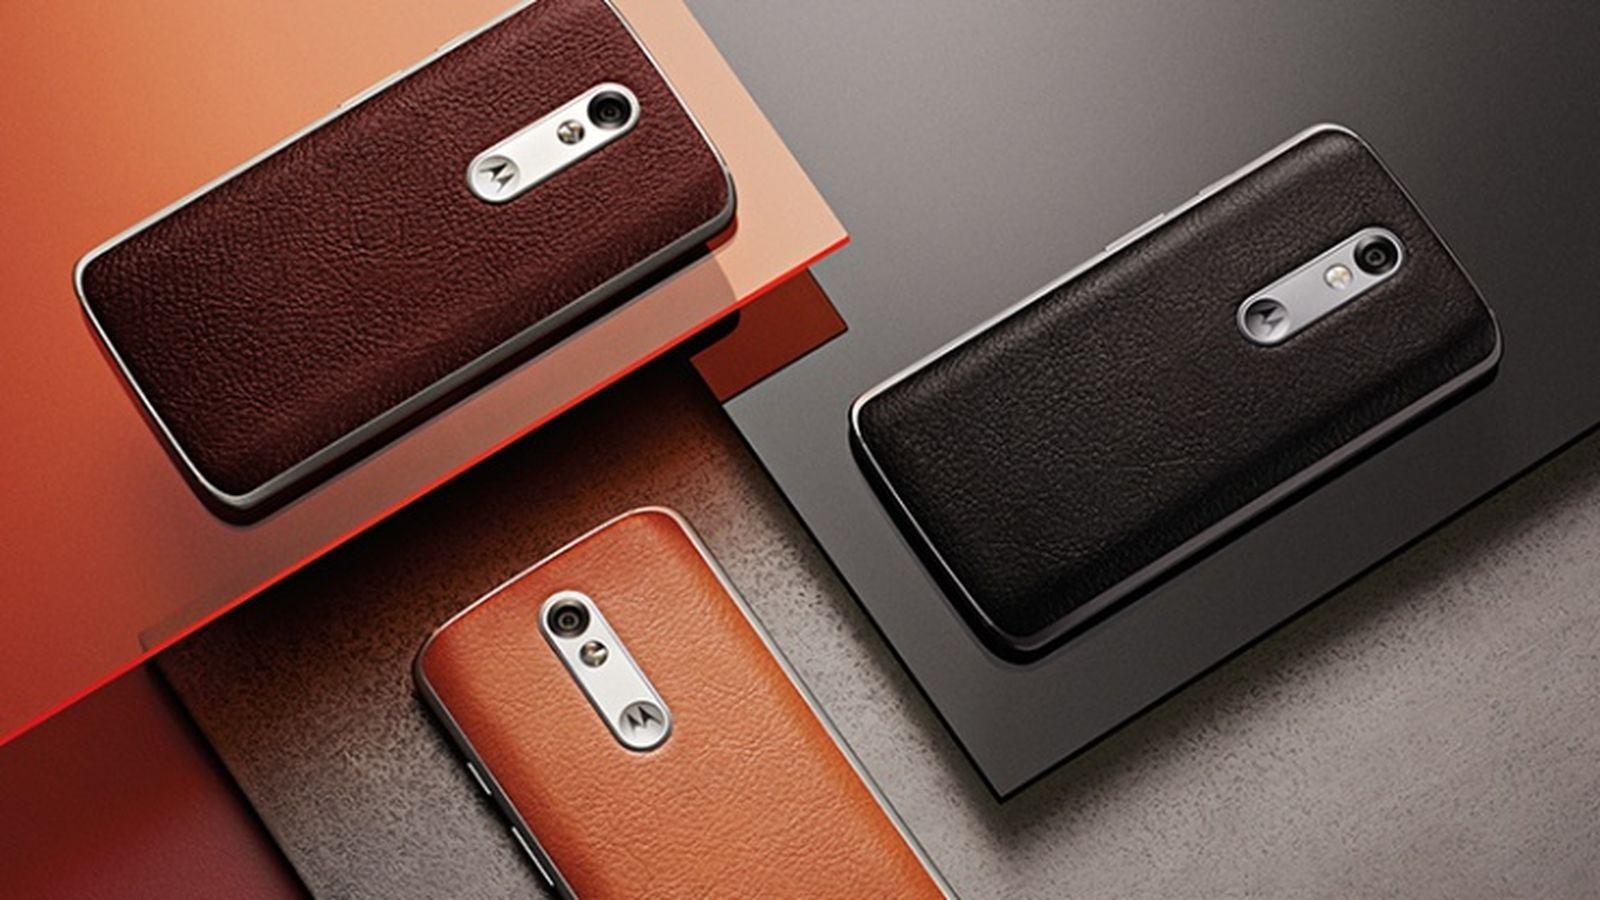 Android 7.0 Nougat Güncellemesi Alacak Olan Motorola (Lenovo) telefonlar